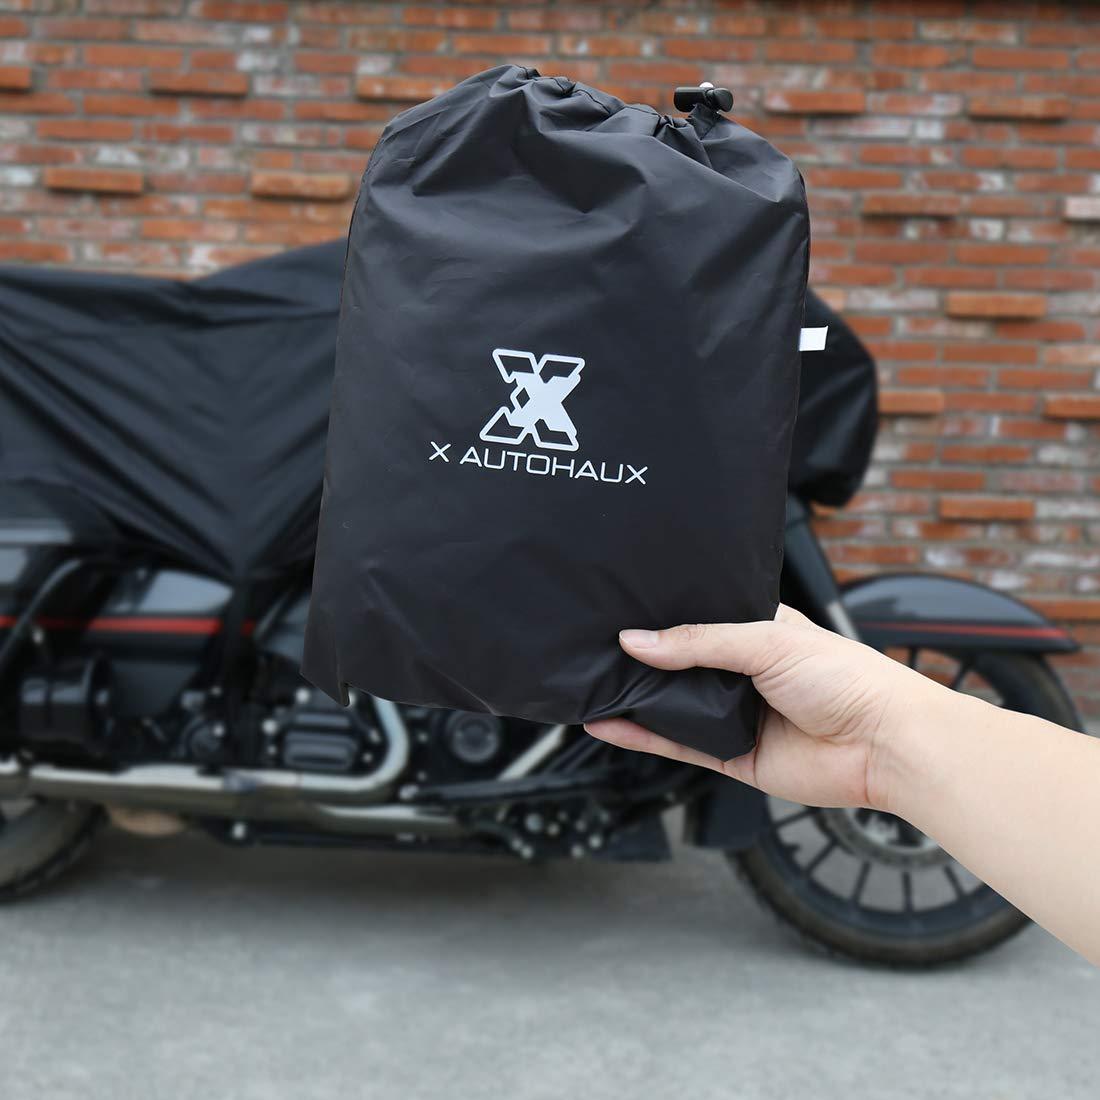 X AUTOHAUX L Black Motorcycle Half Cover Outdoor Waterproof Rain Dust UV Protector